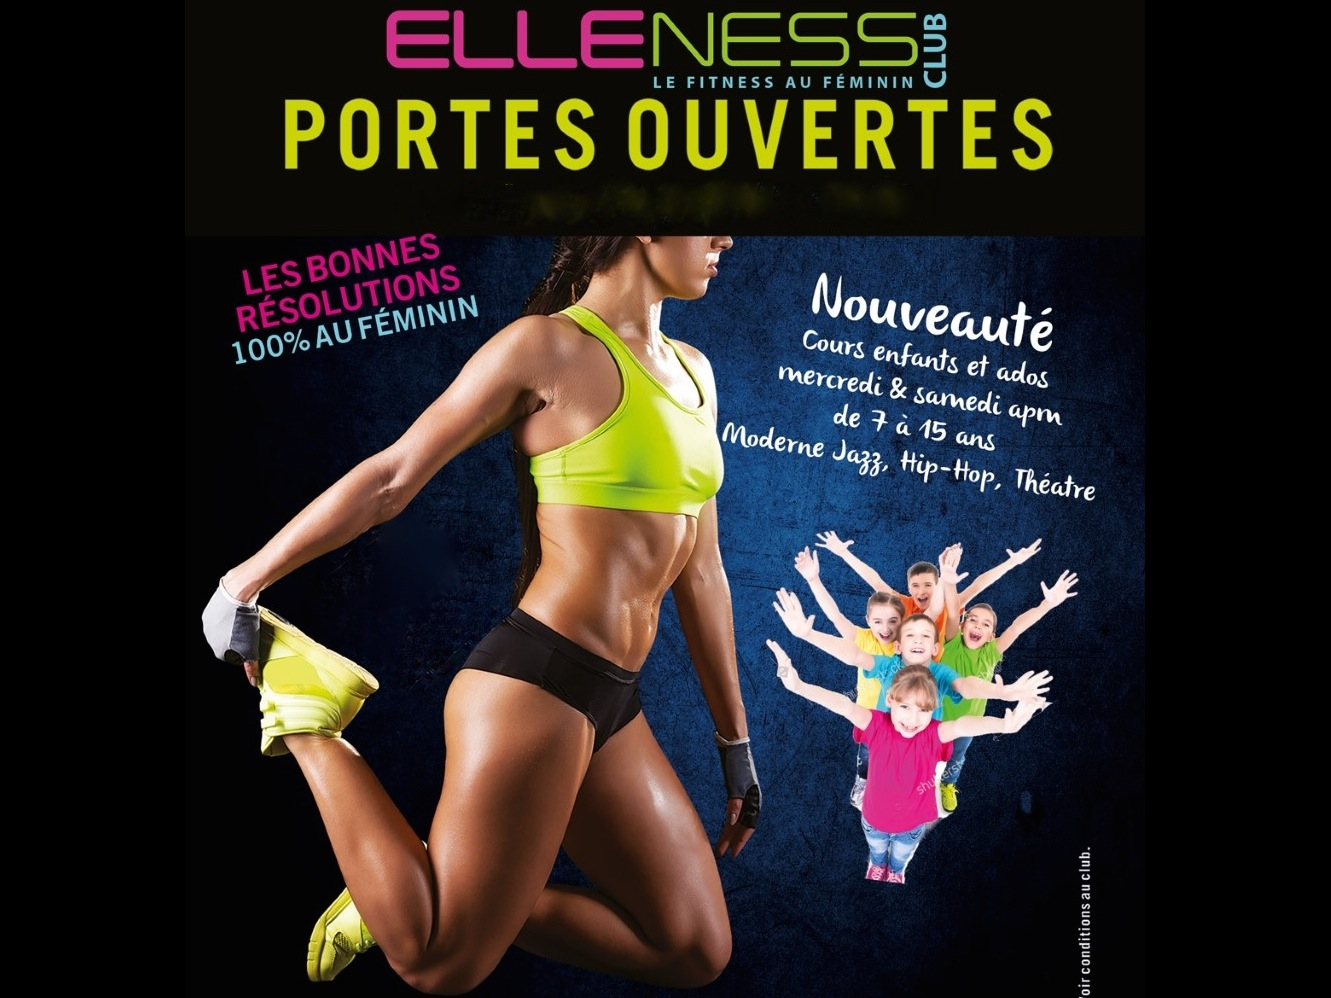 Elleness Montreuil